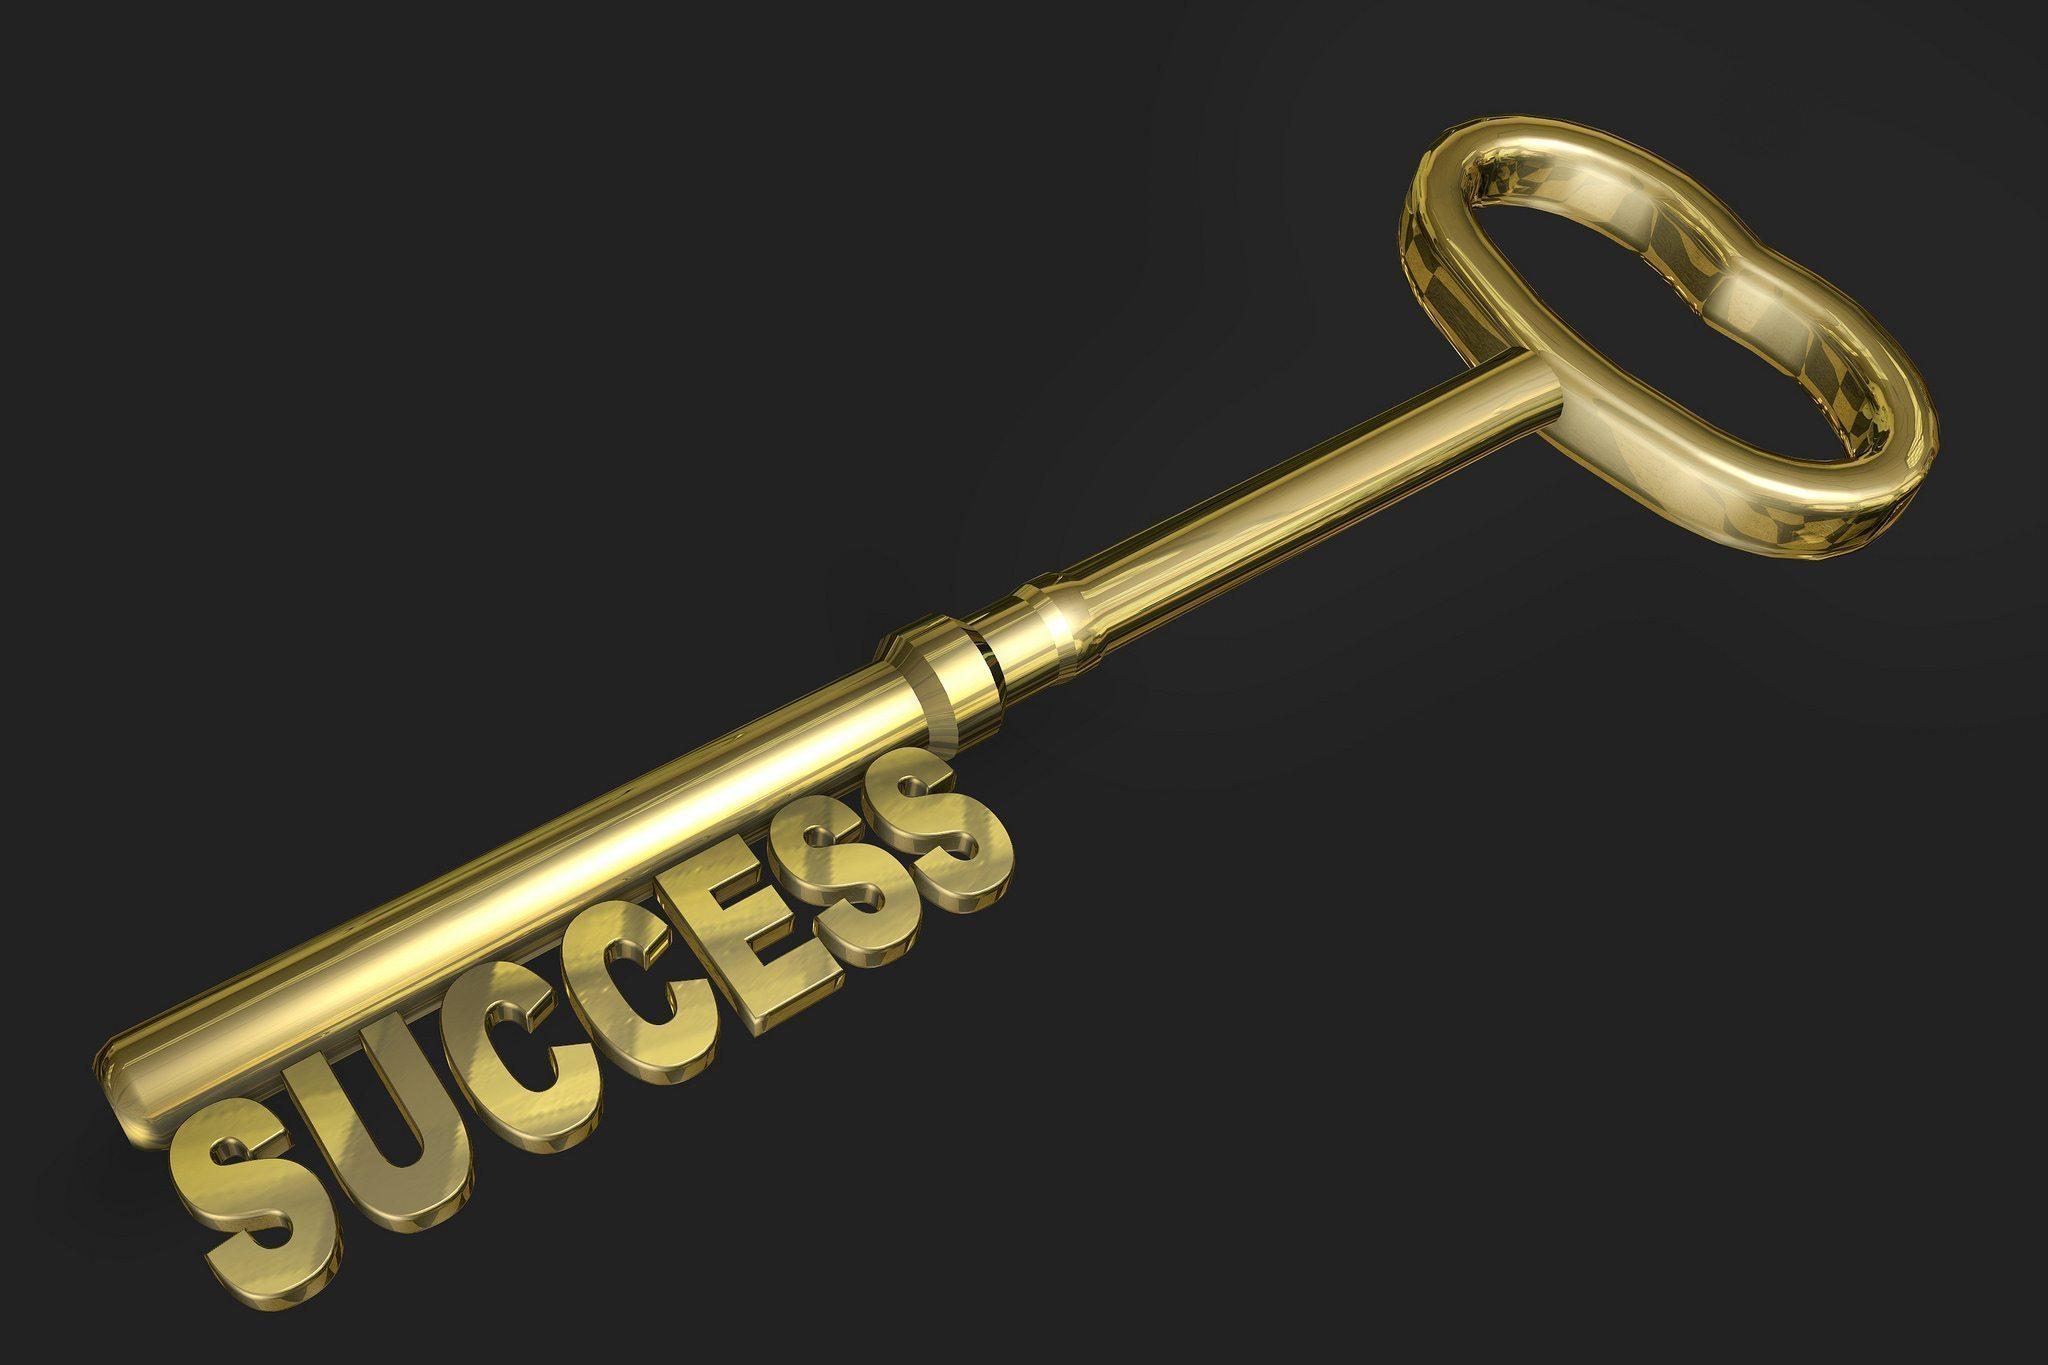 PunjabKesari, Success, सफलता